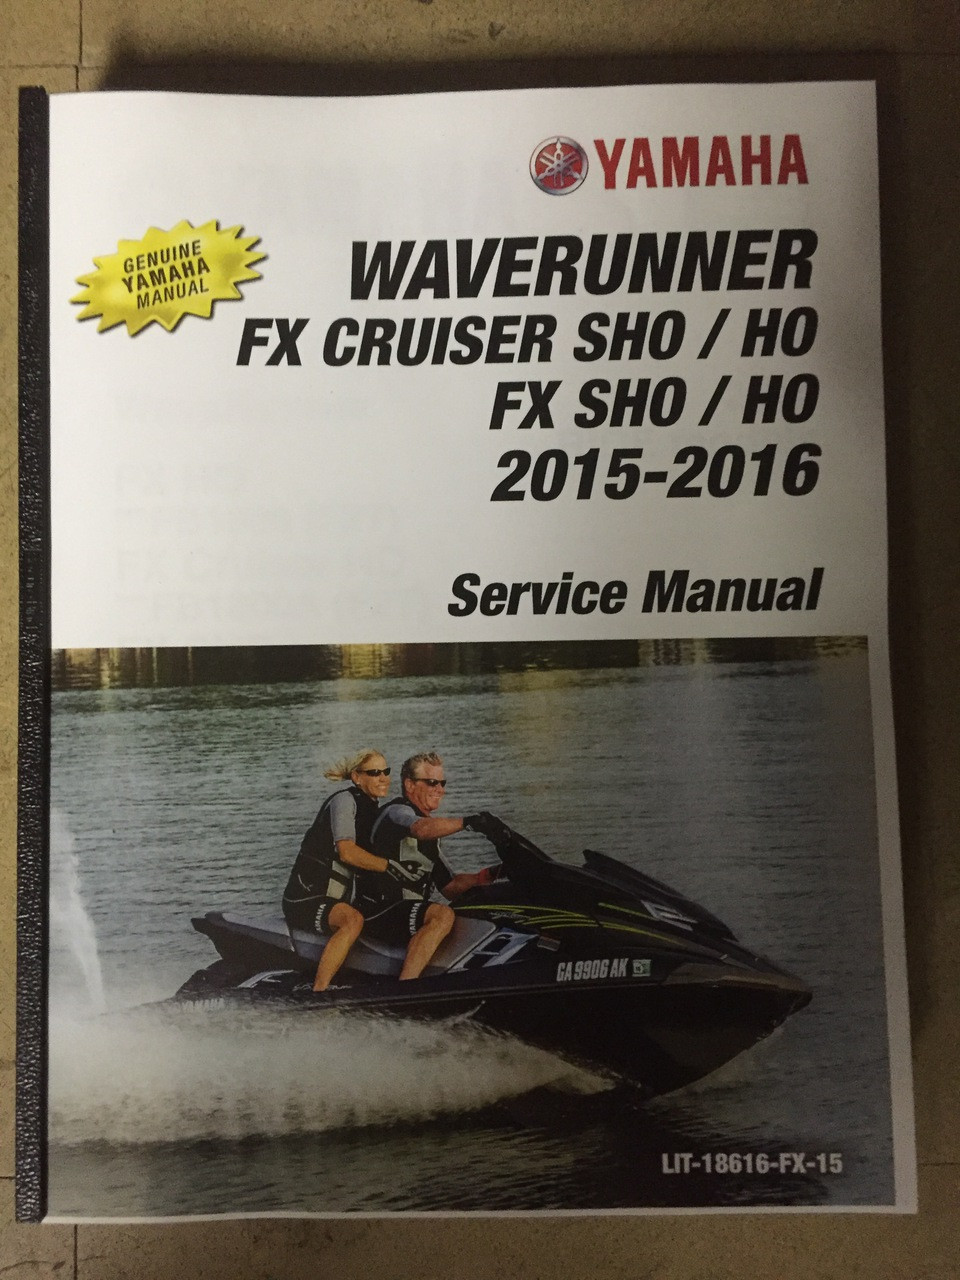 2015 2016 yamaha waverunner fx cruiser sho fx crsuier ho fx sho rh service shop repair manual com yamaha fx cruiser sho service manual 2012 yamaha fx cruiser sho owners manual